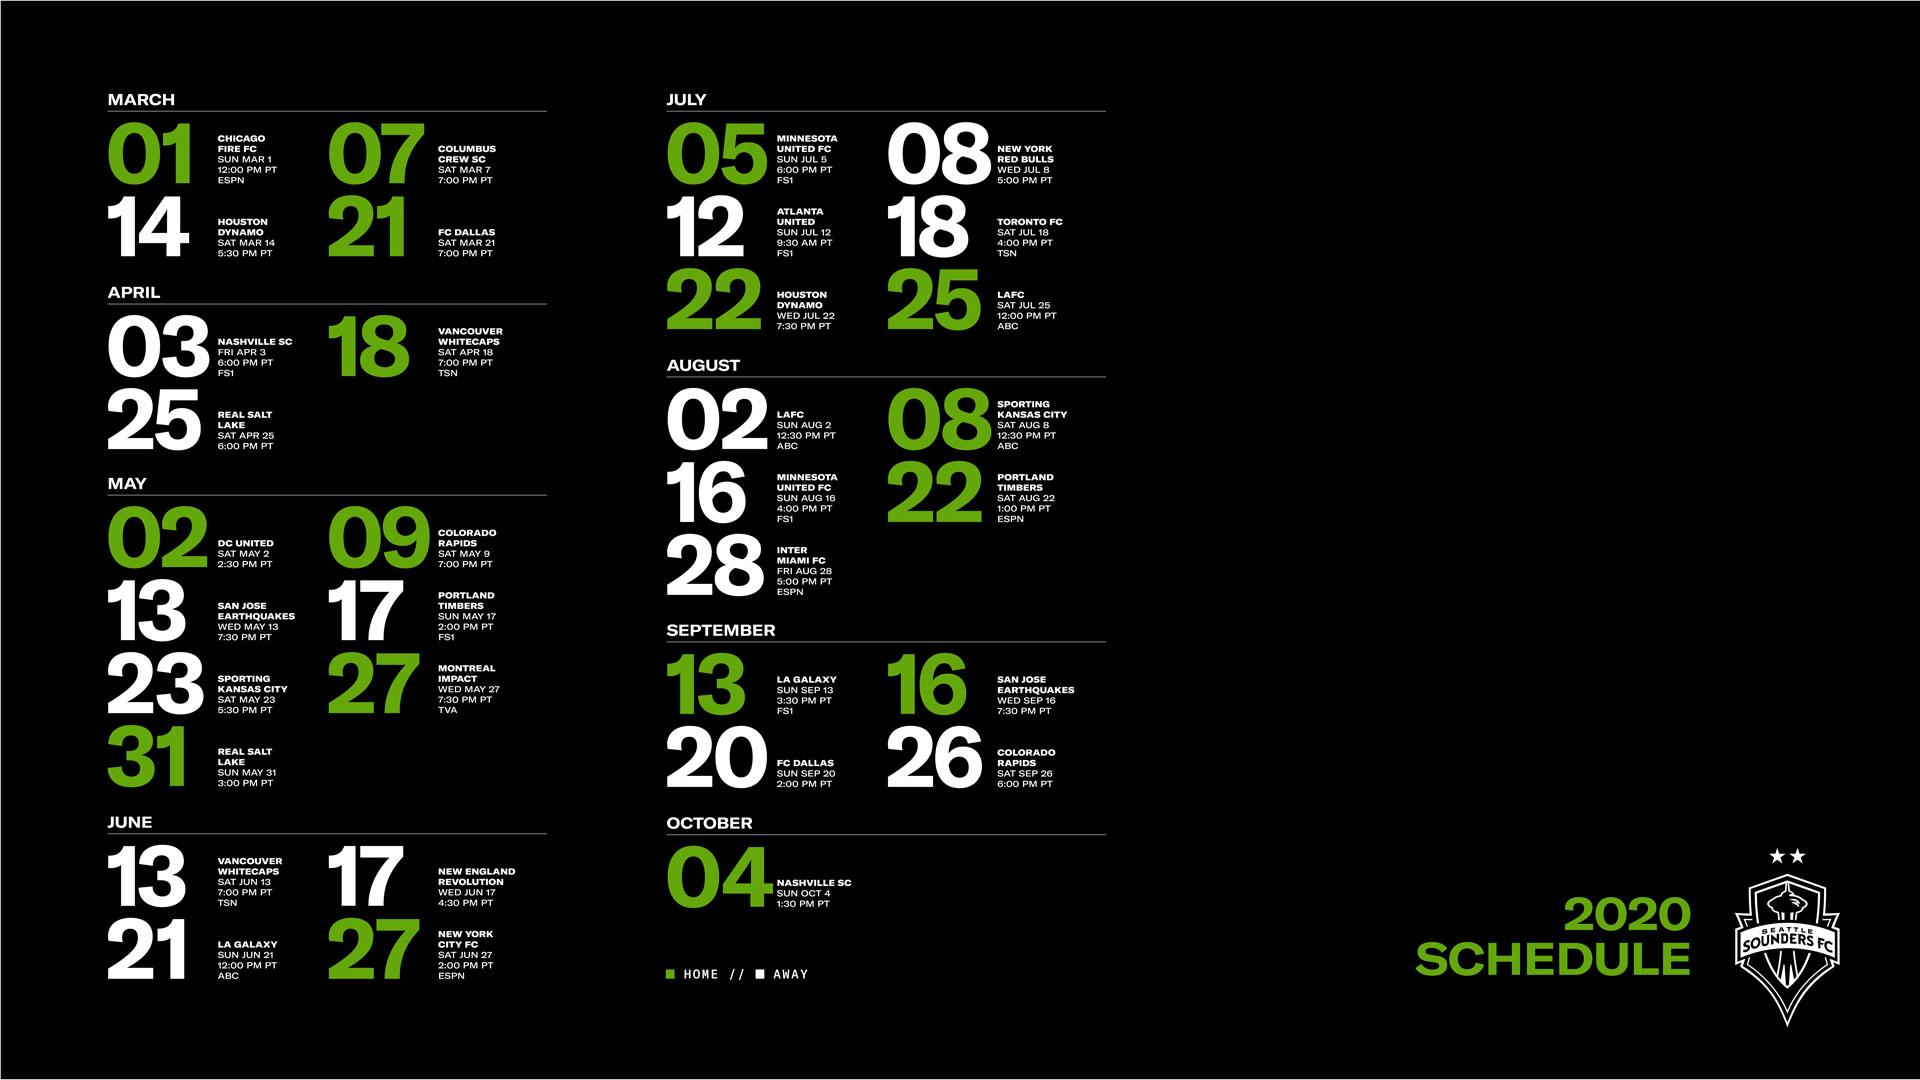 Sounders FC 2020 Schedule Wallpaper Seattle Sounders FC 1920x1080